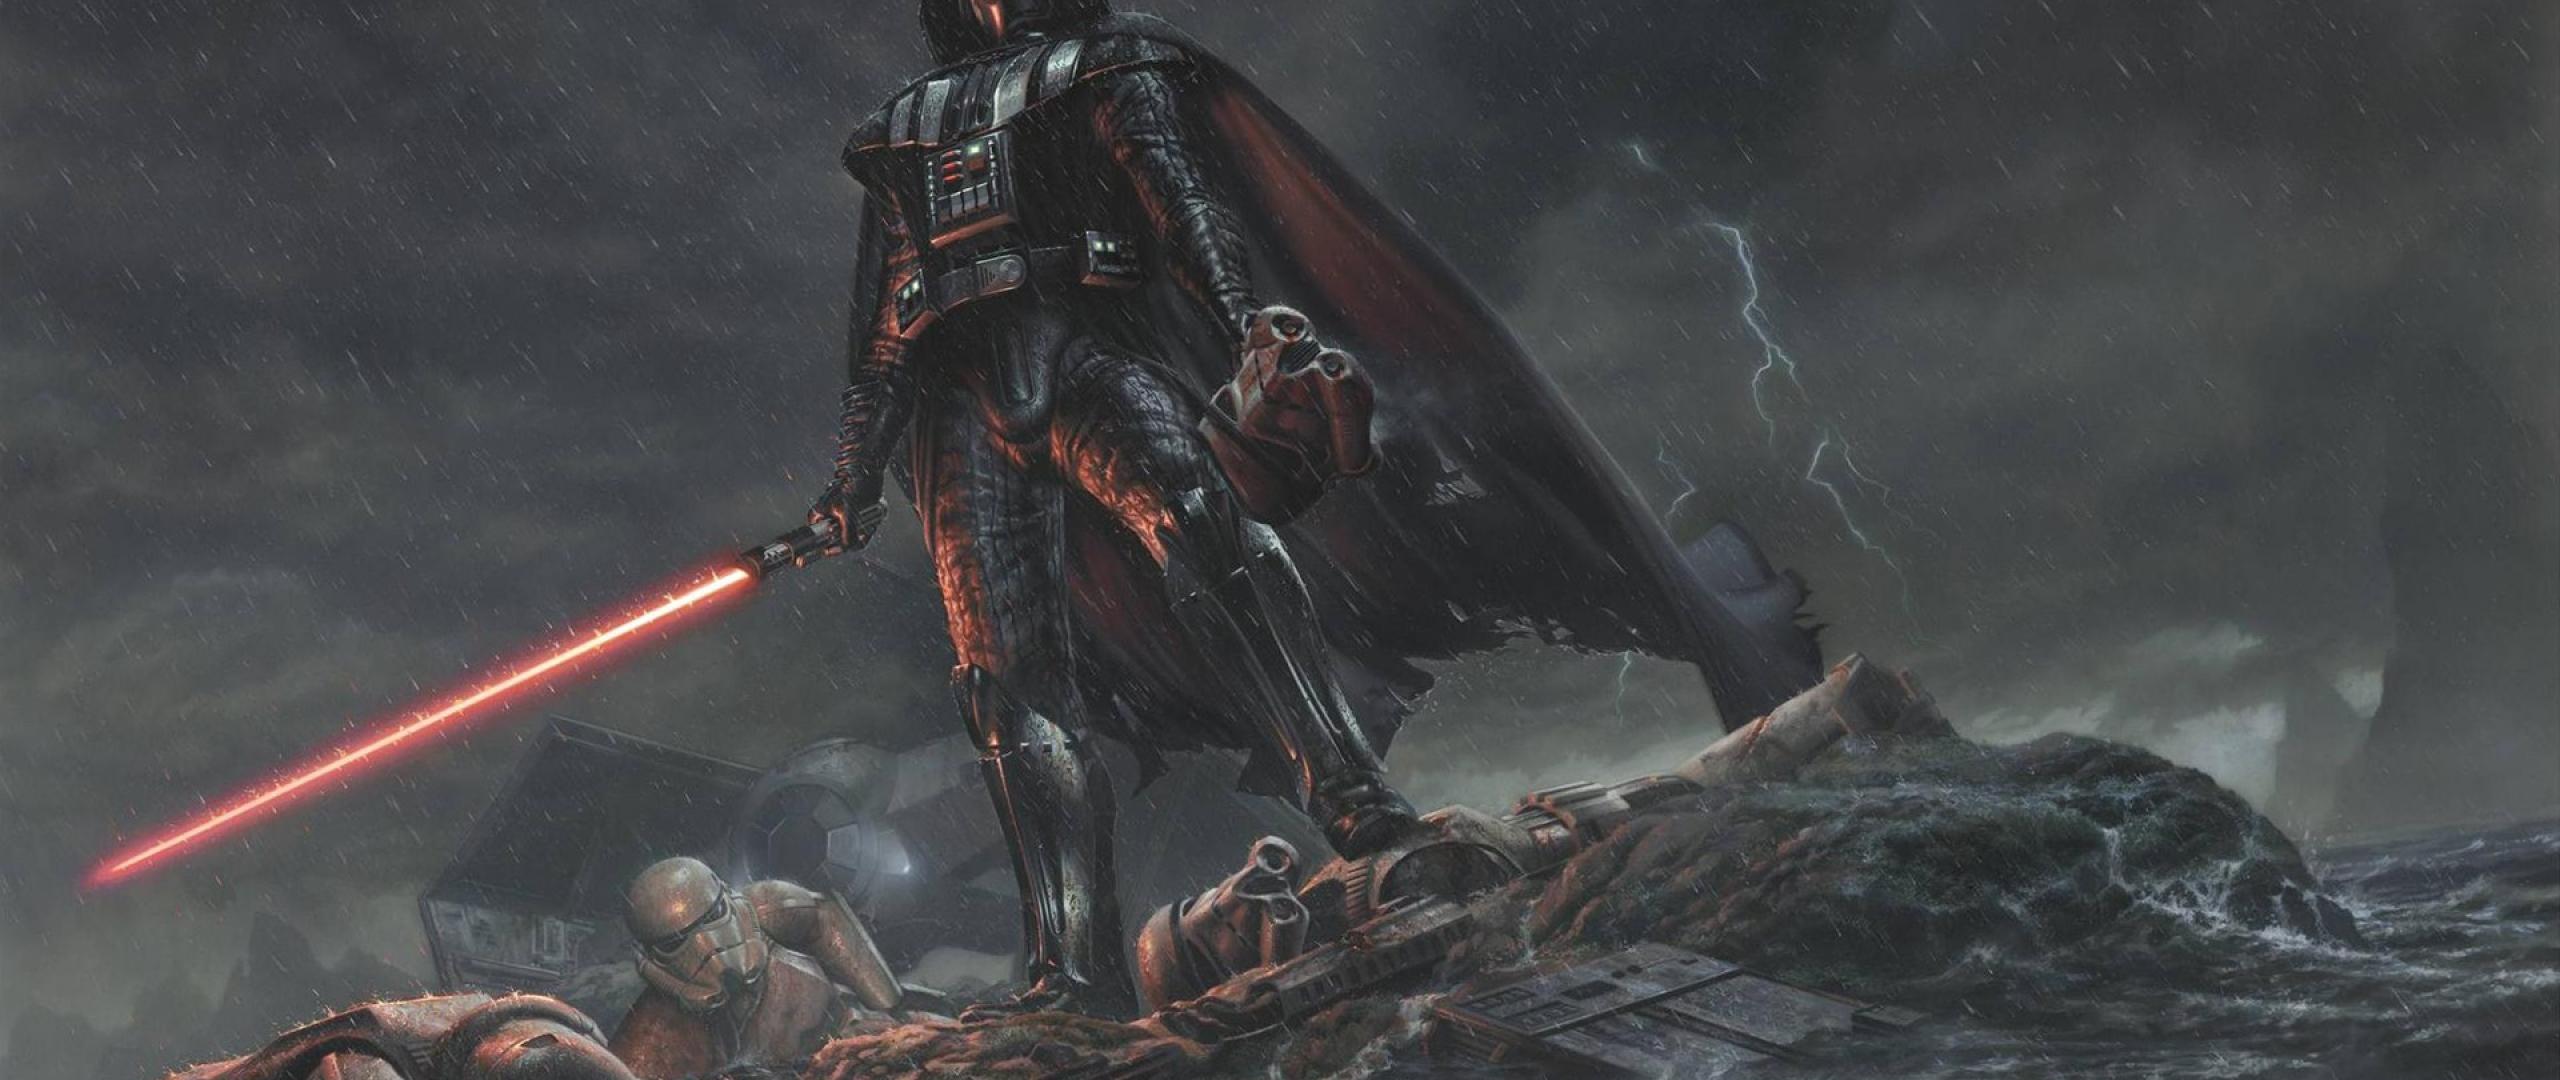 Storm Trooper Wallpaper Darth Vader